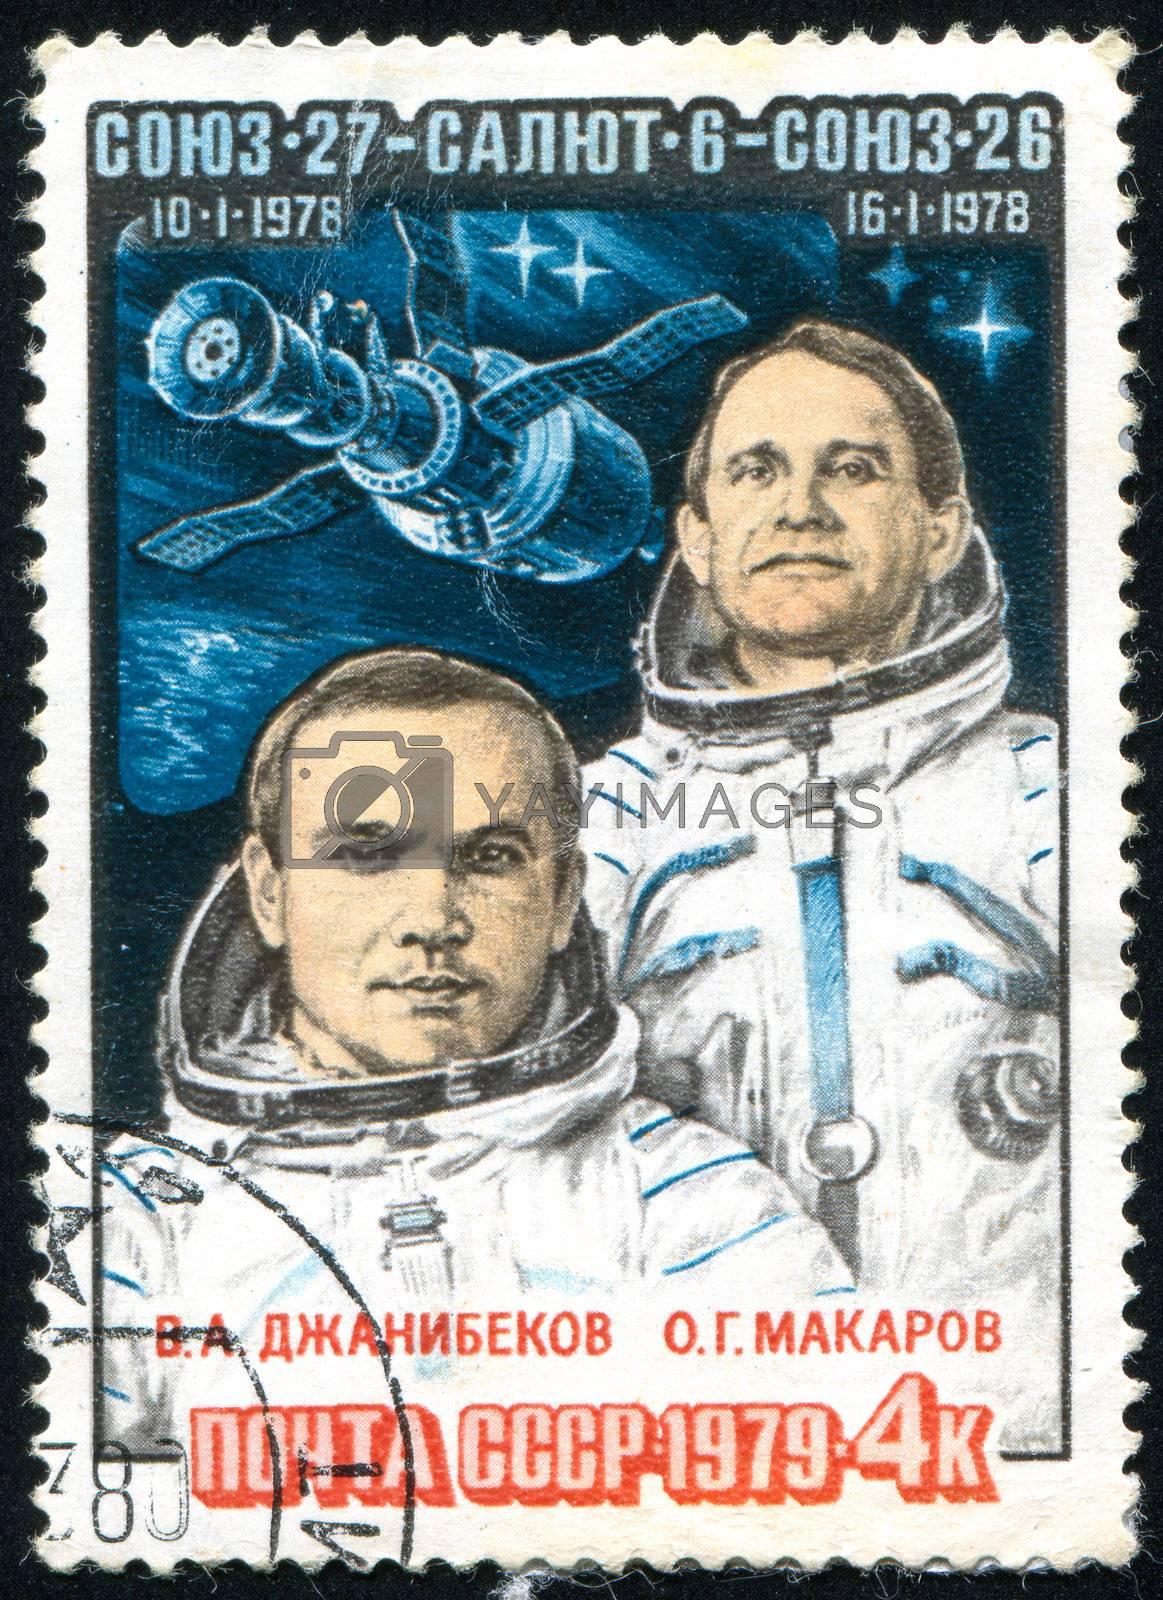 RUSSIA - CIRCA 1979: stamp printed by Russia, shows Djanibekov and Makarov, Spacecraft, circa 1979.